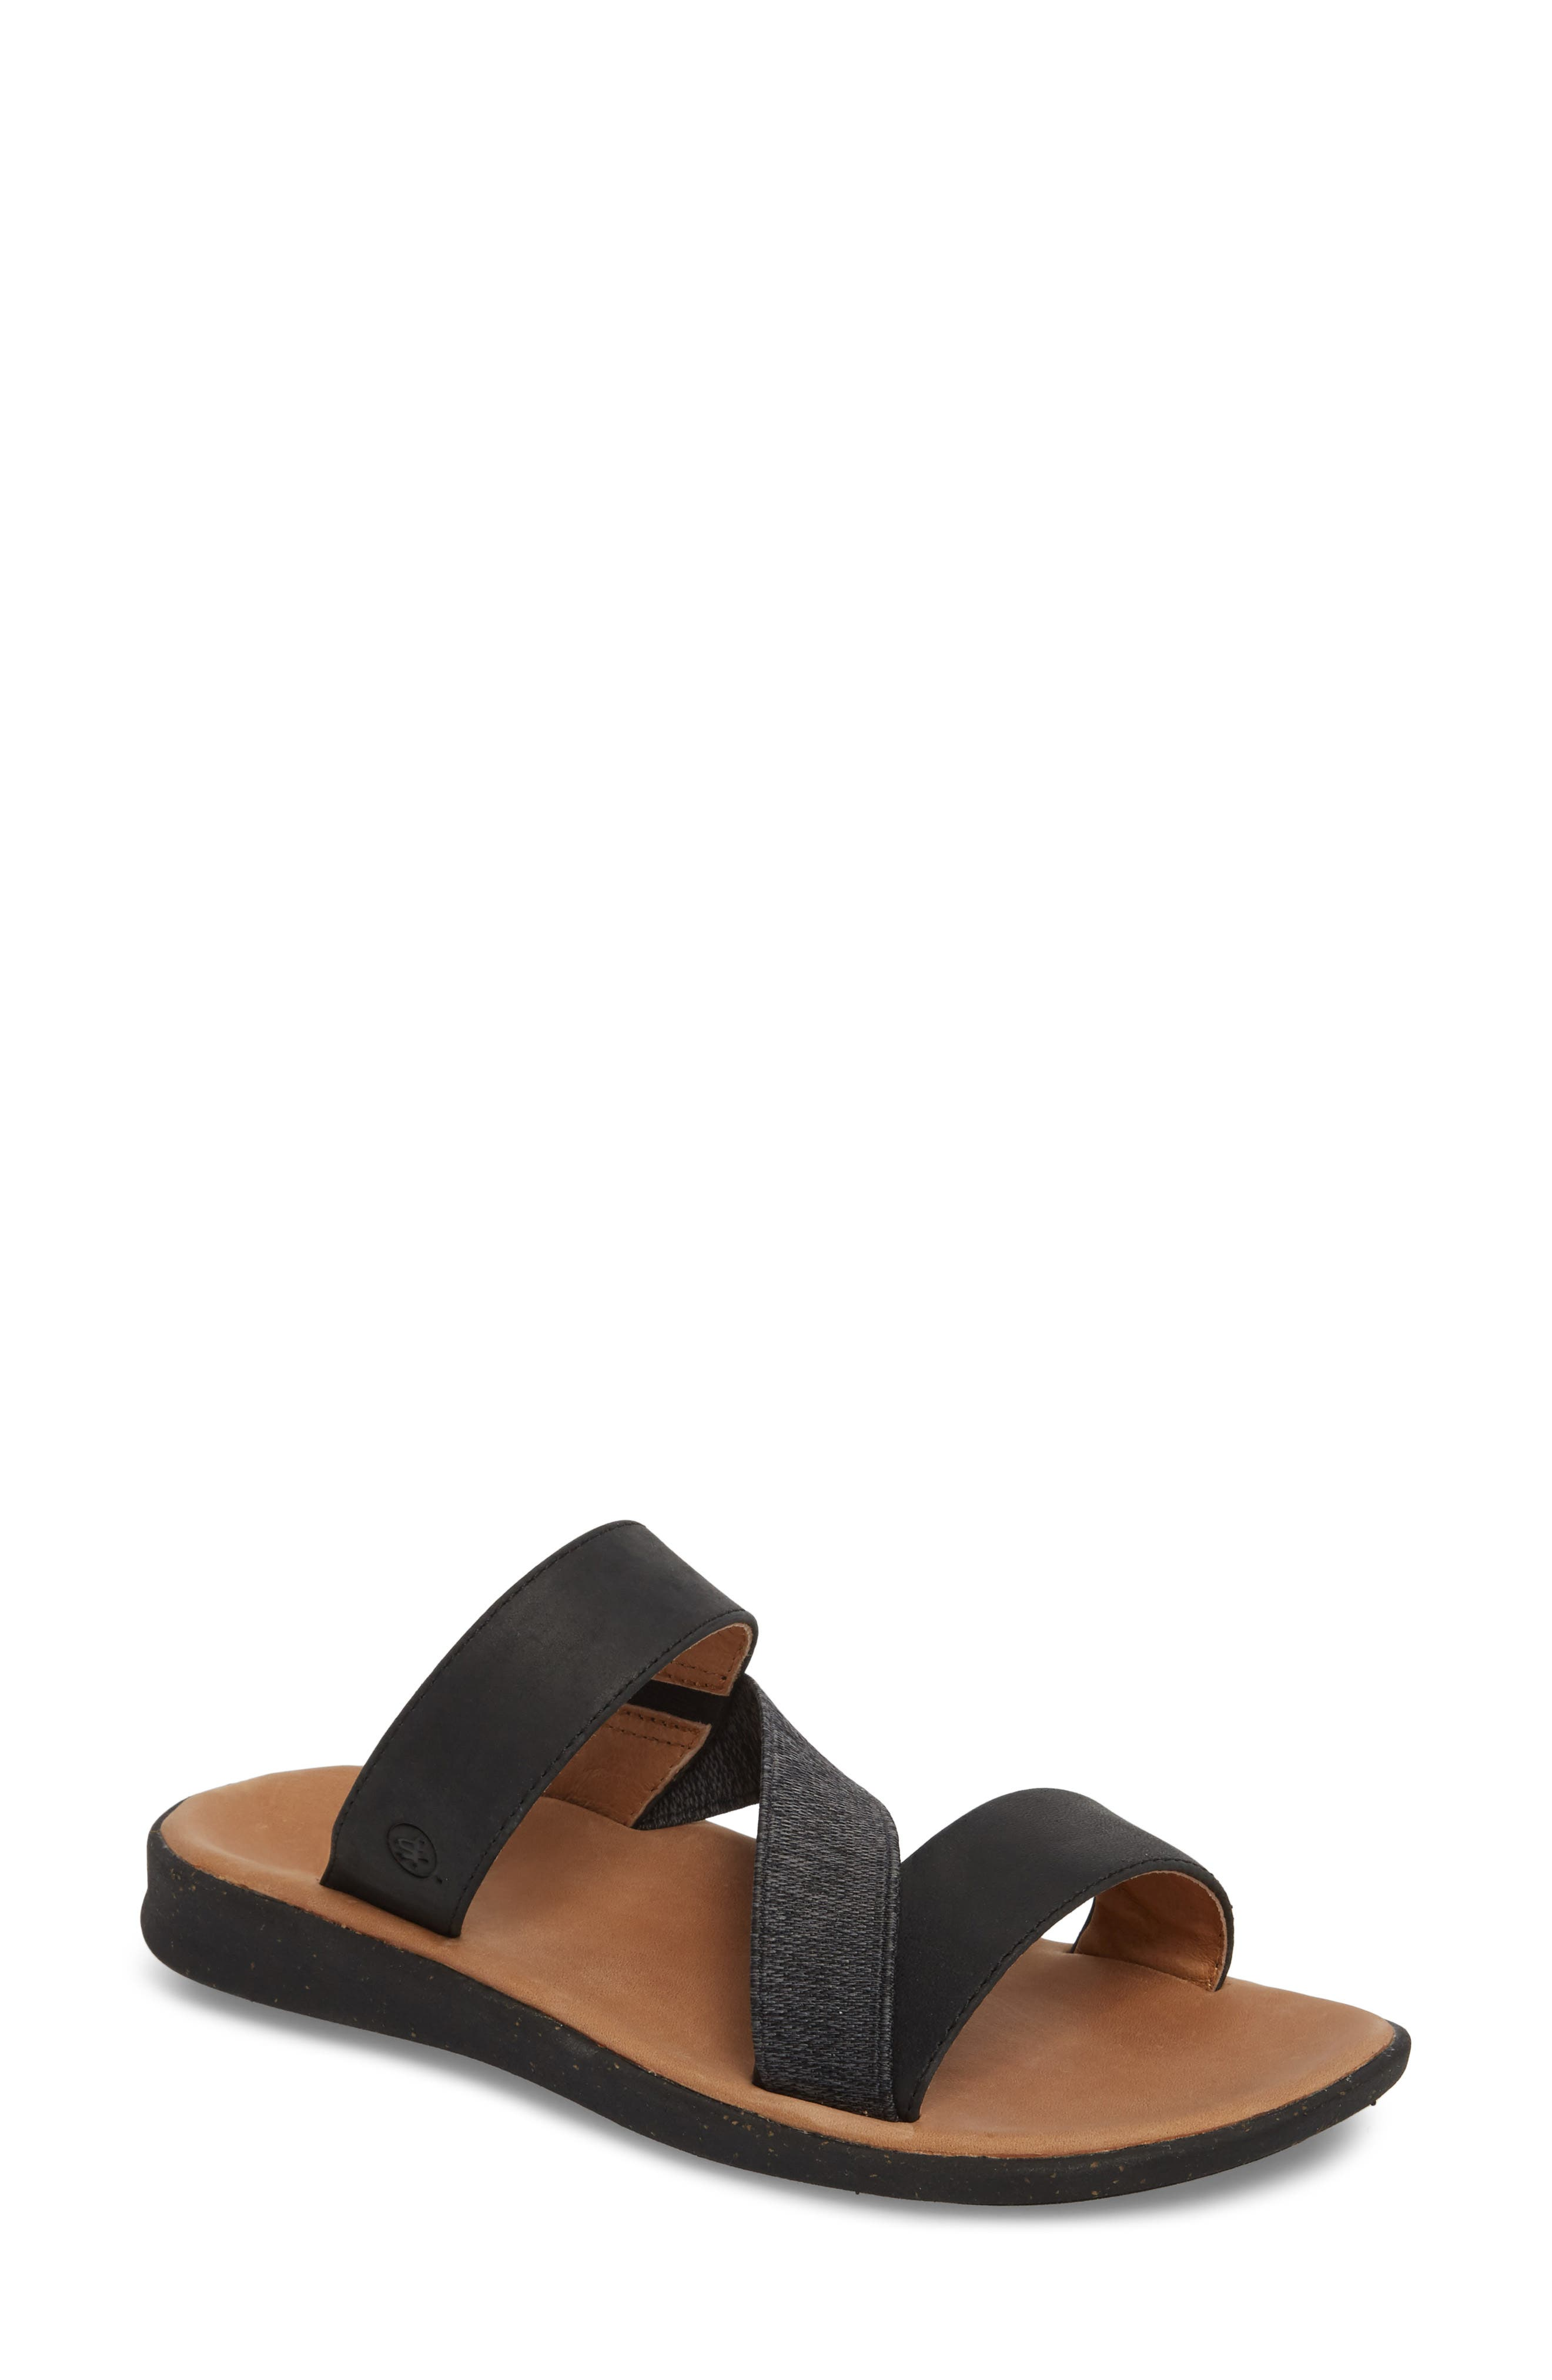 Reyes Slide Sandal,                             Main thumbnail 1, color,                             Black Leather